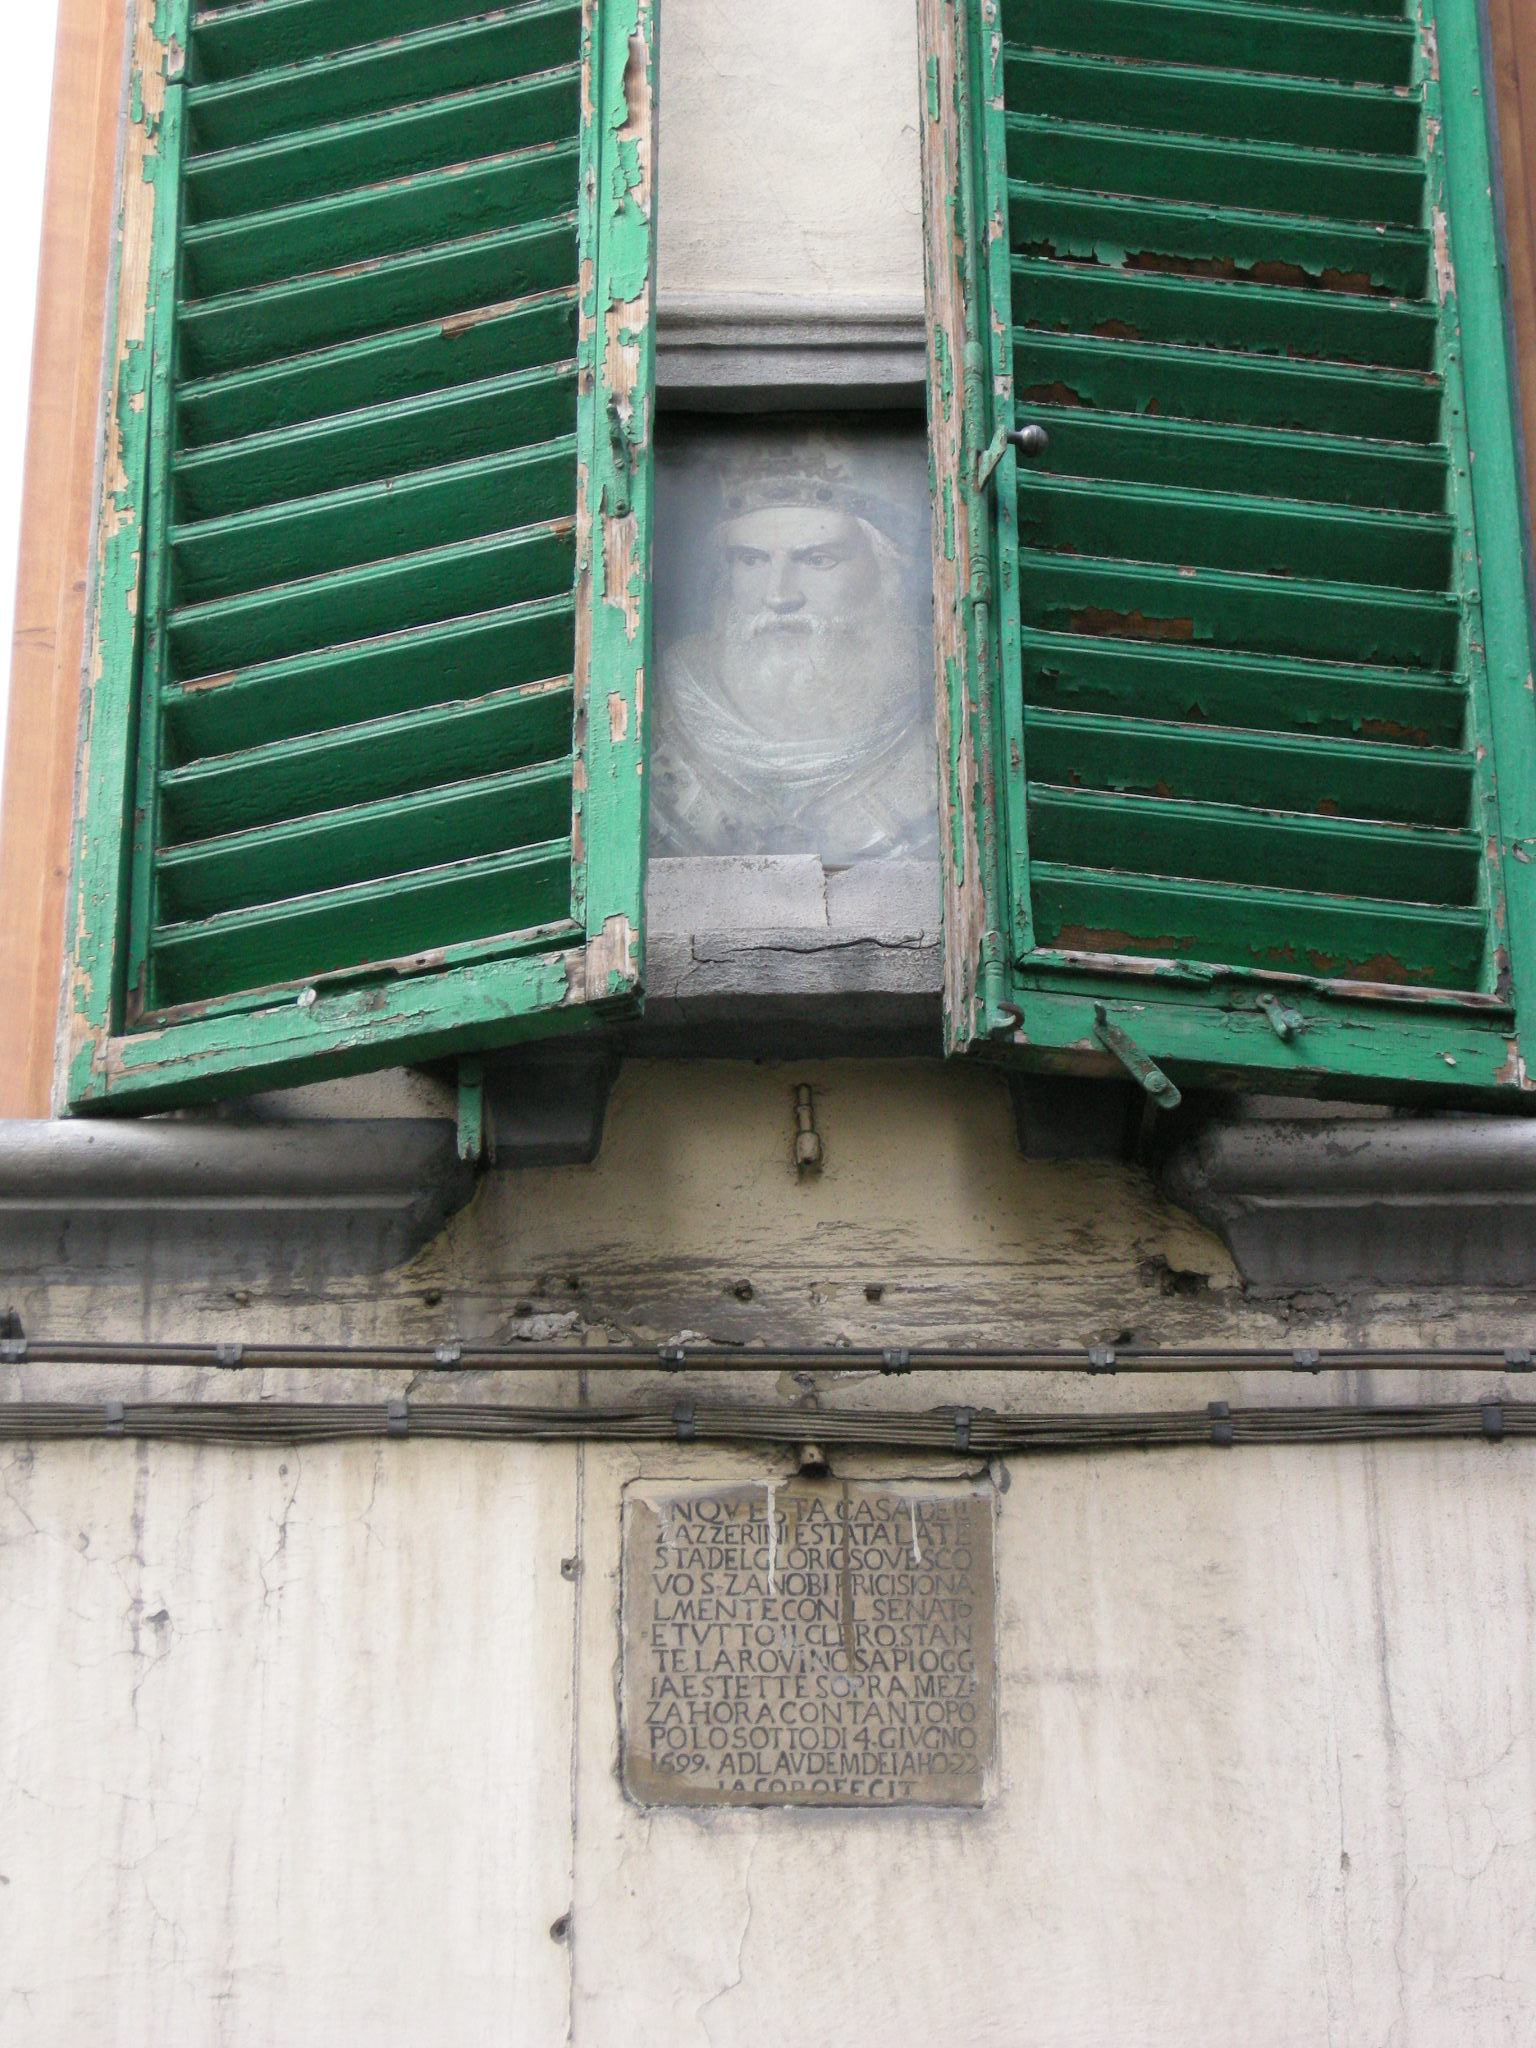 File:Via della pergola, targa.JPG - Wikimedia Commons